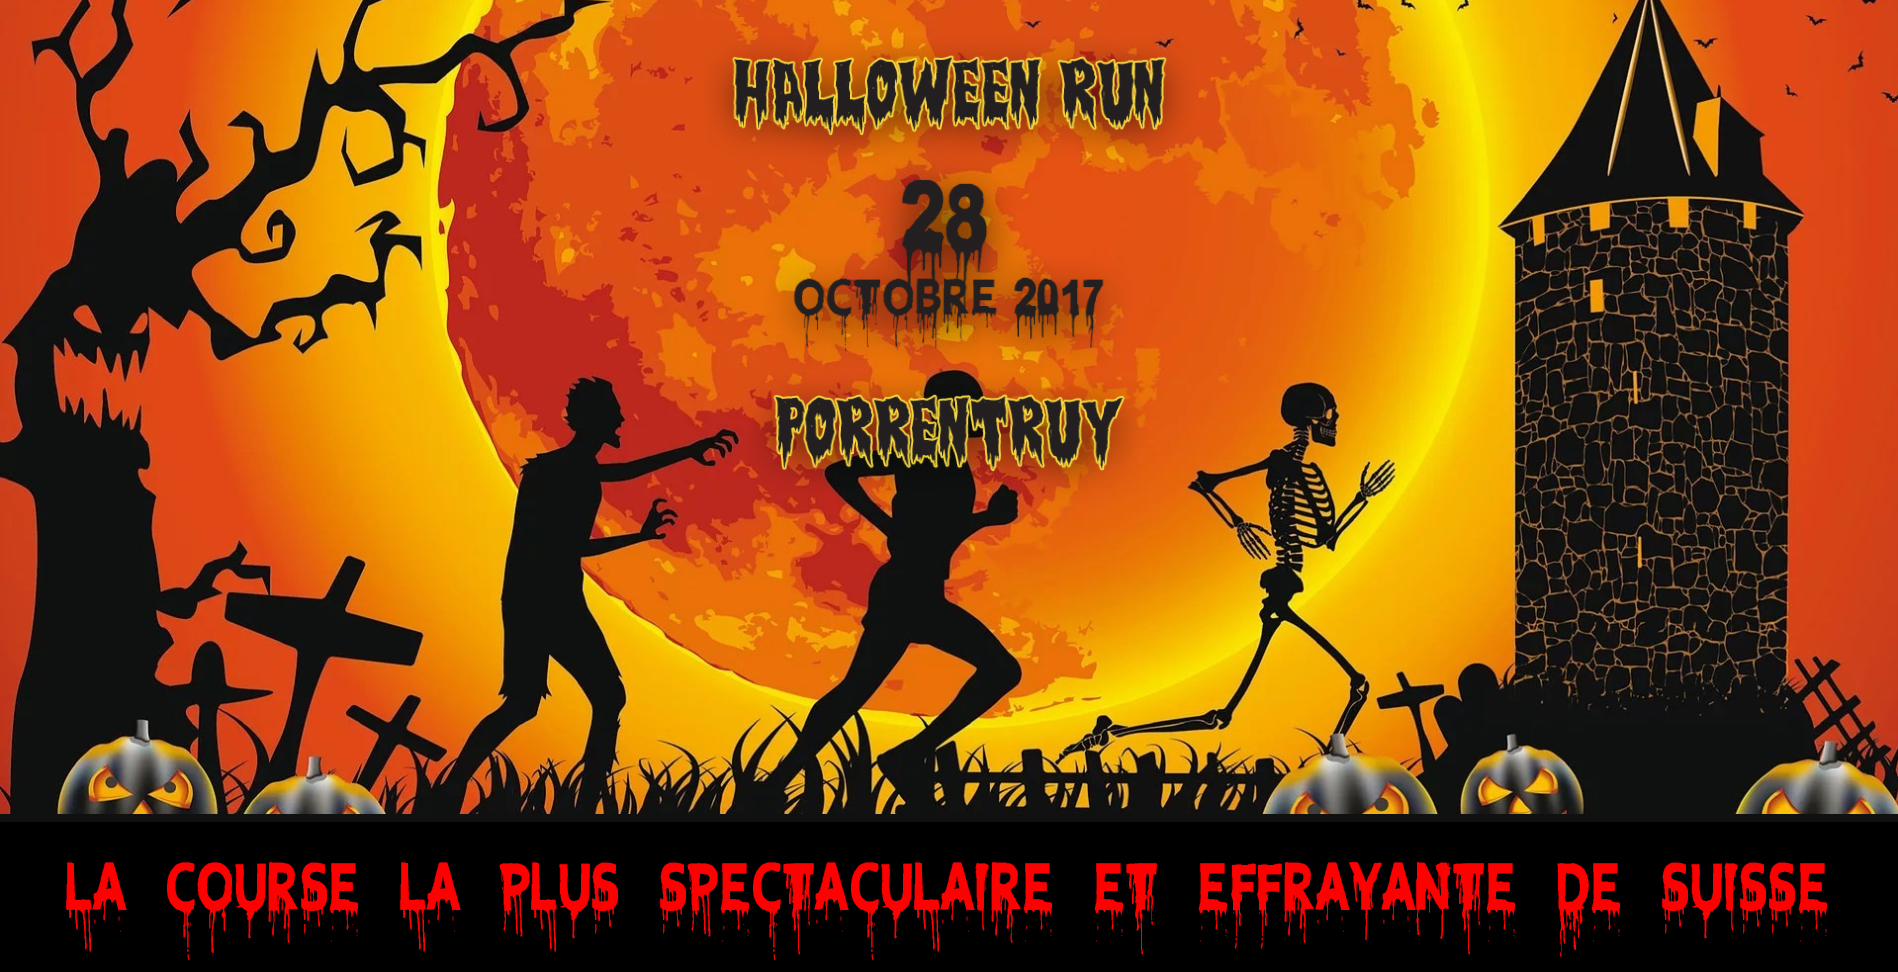 Connu Halloween Run et Course de la vieille Ville - 2017 - MSO-Chrono [FR] VM57